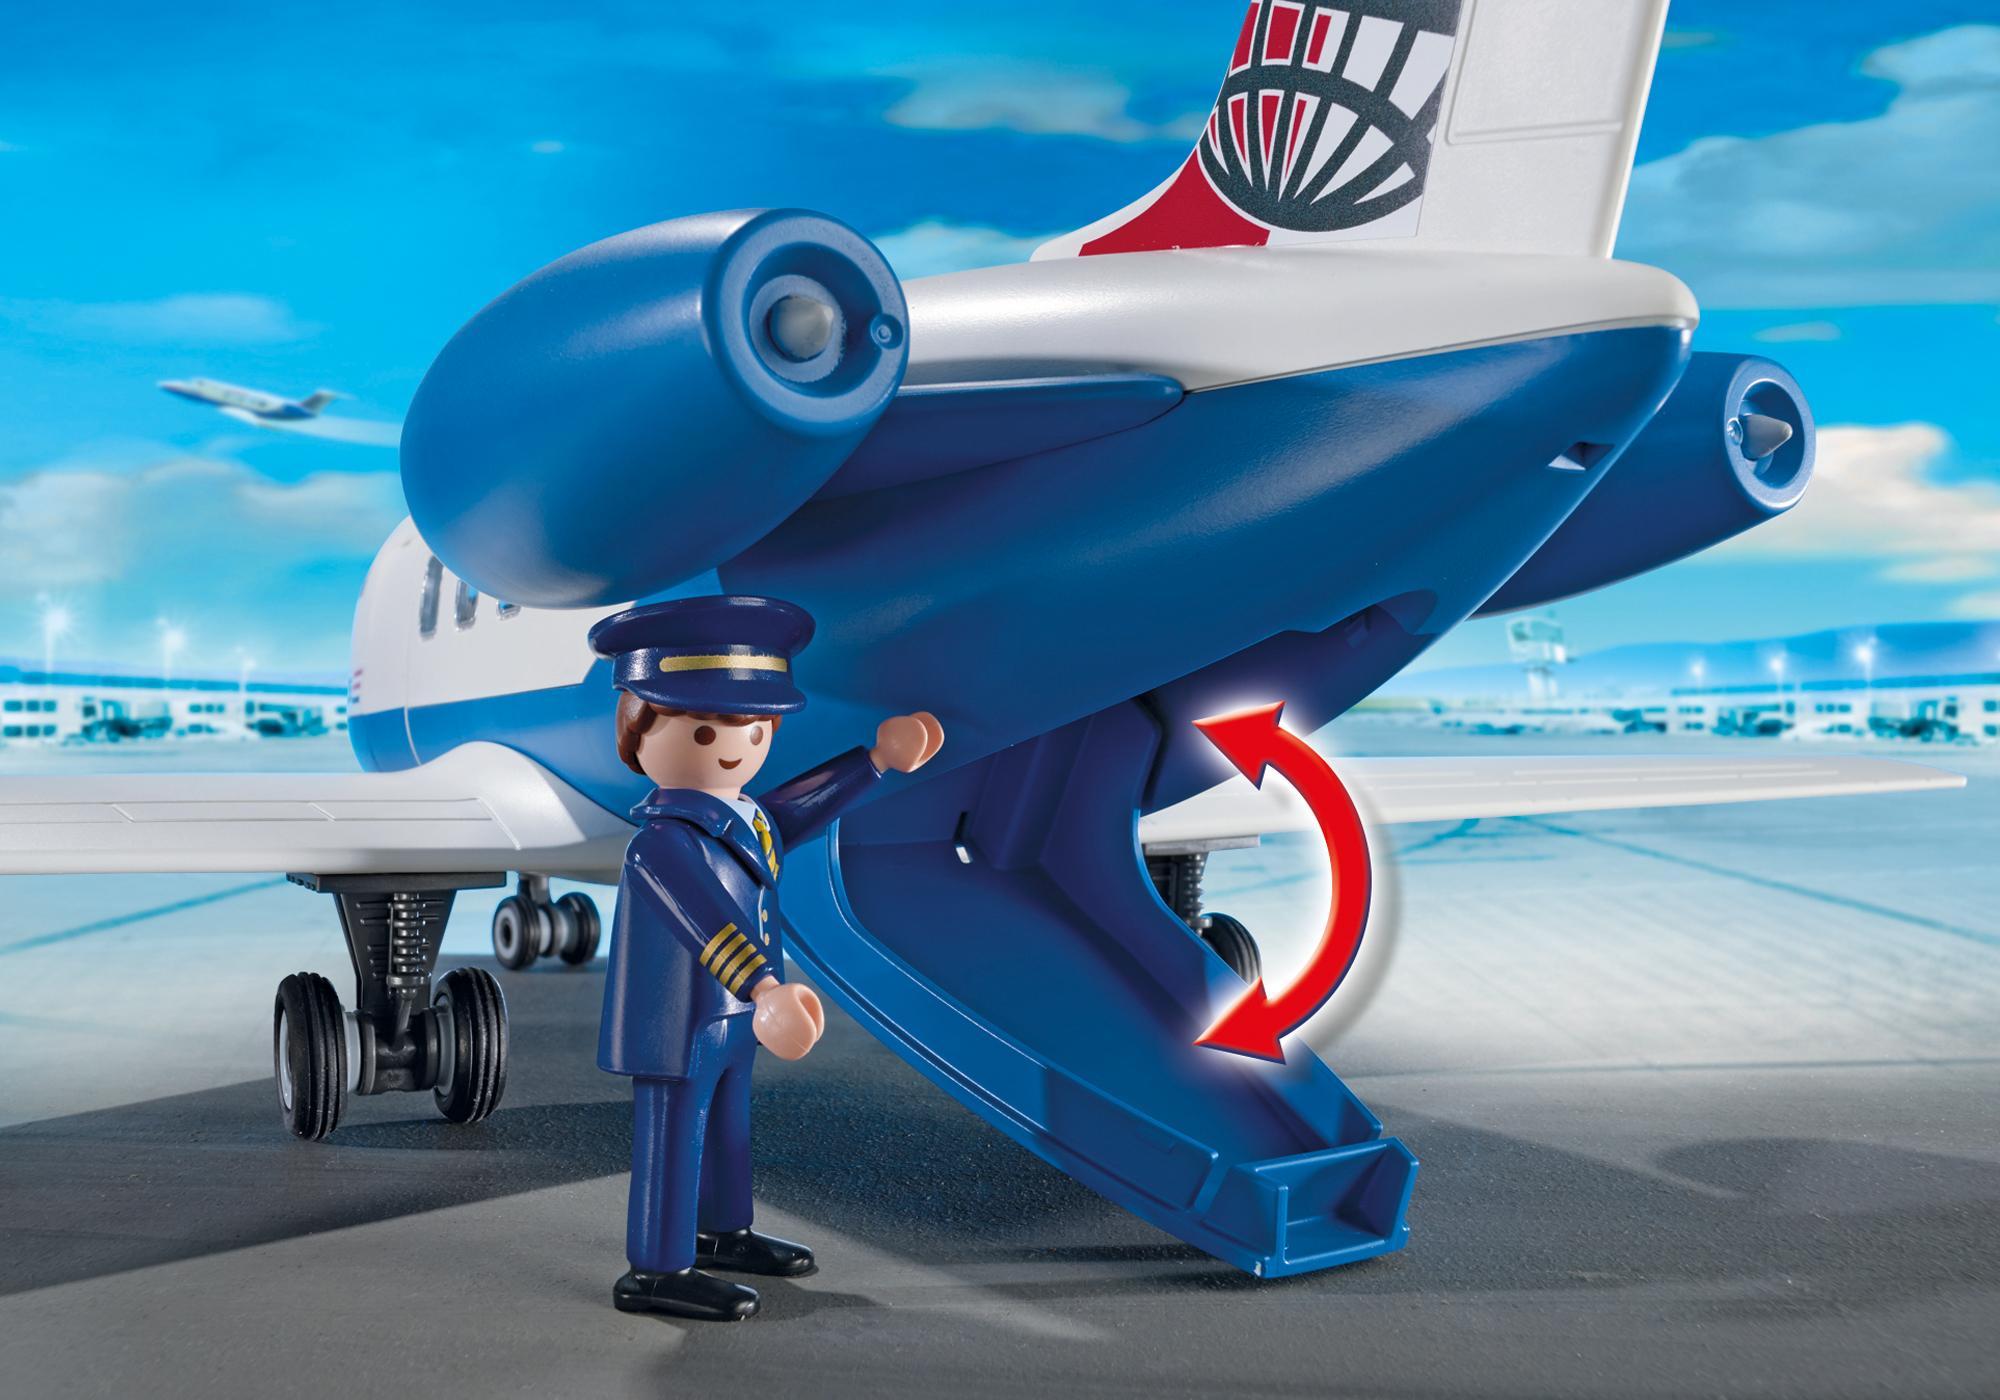 http://media.playmobil.com/i/playmobil/5395_product_extra1/Passenger Plane